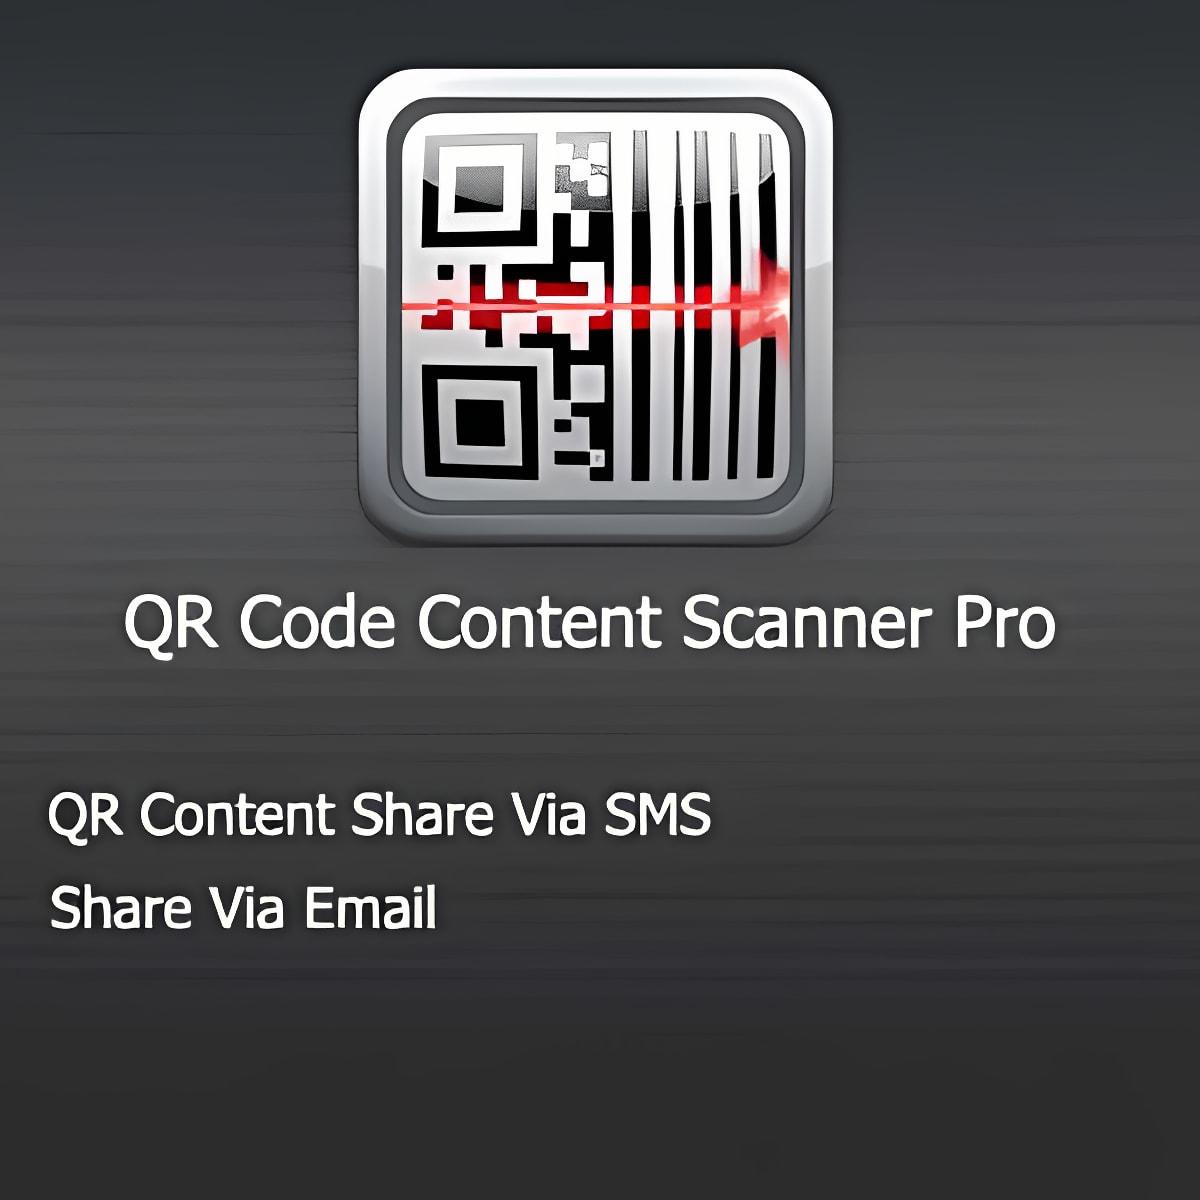 QR Code Content Scanner Pro